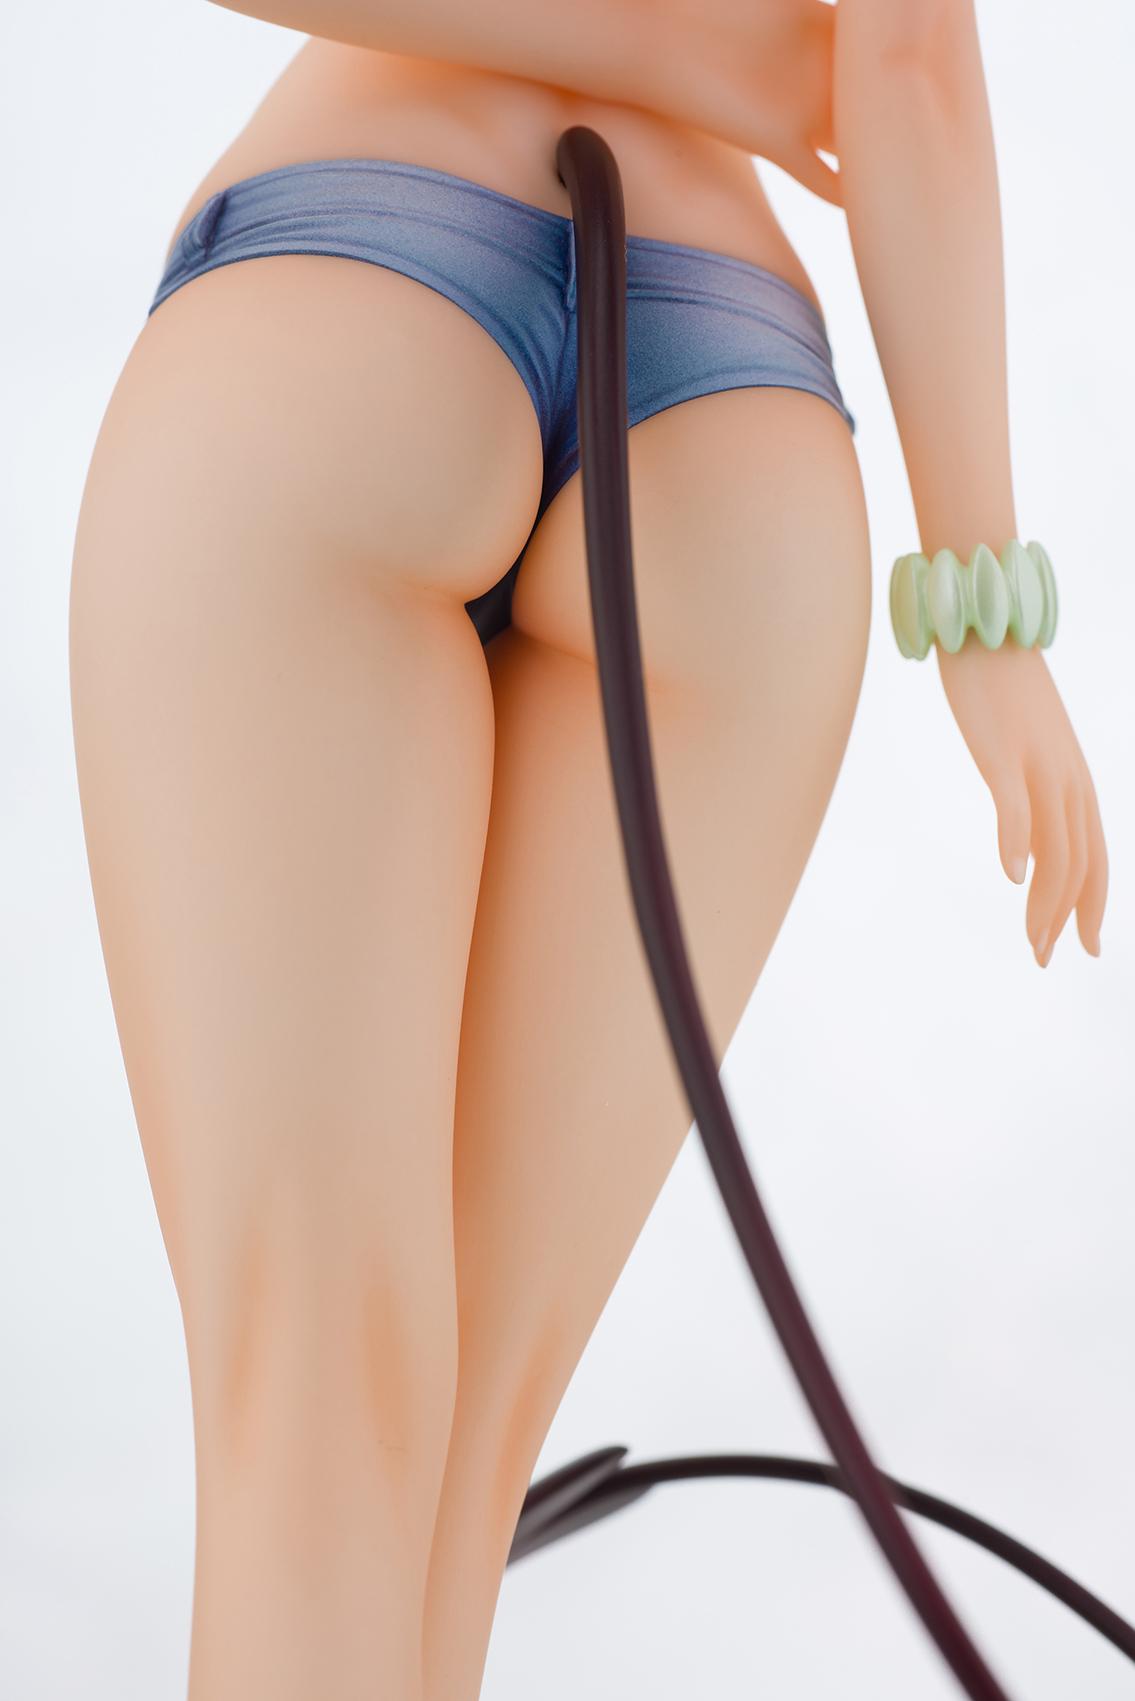 Lala Satalin Deviluke Anime Figure Previewed 017